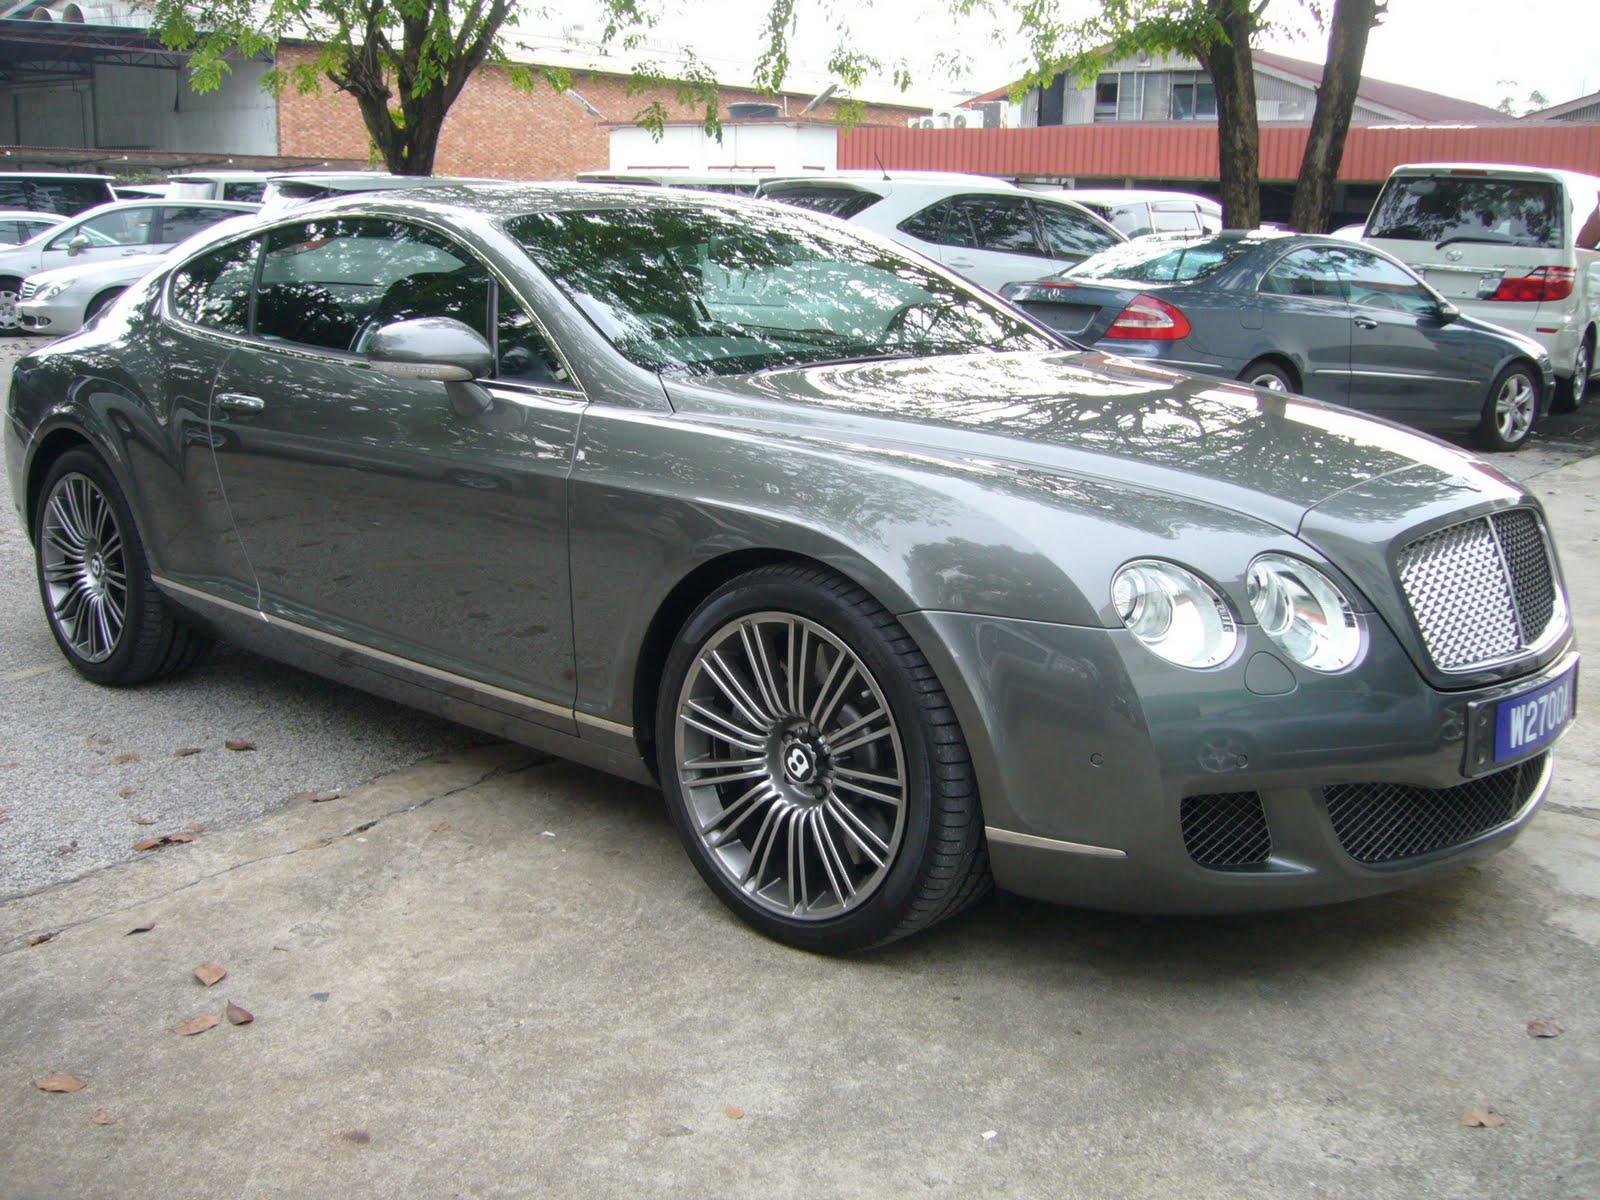 Kl recondition car bentley continental gt speed 07 bentley continental gt speed 07 vanachro Image collections